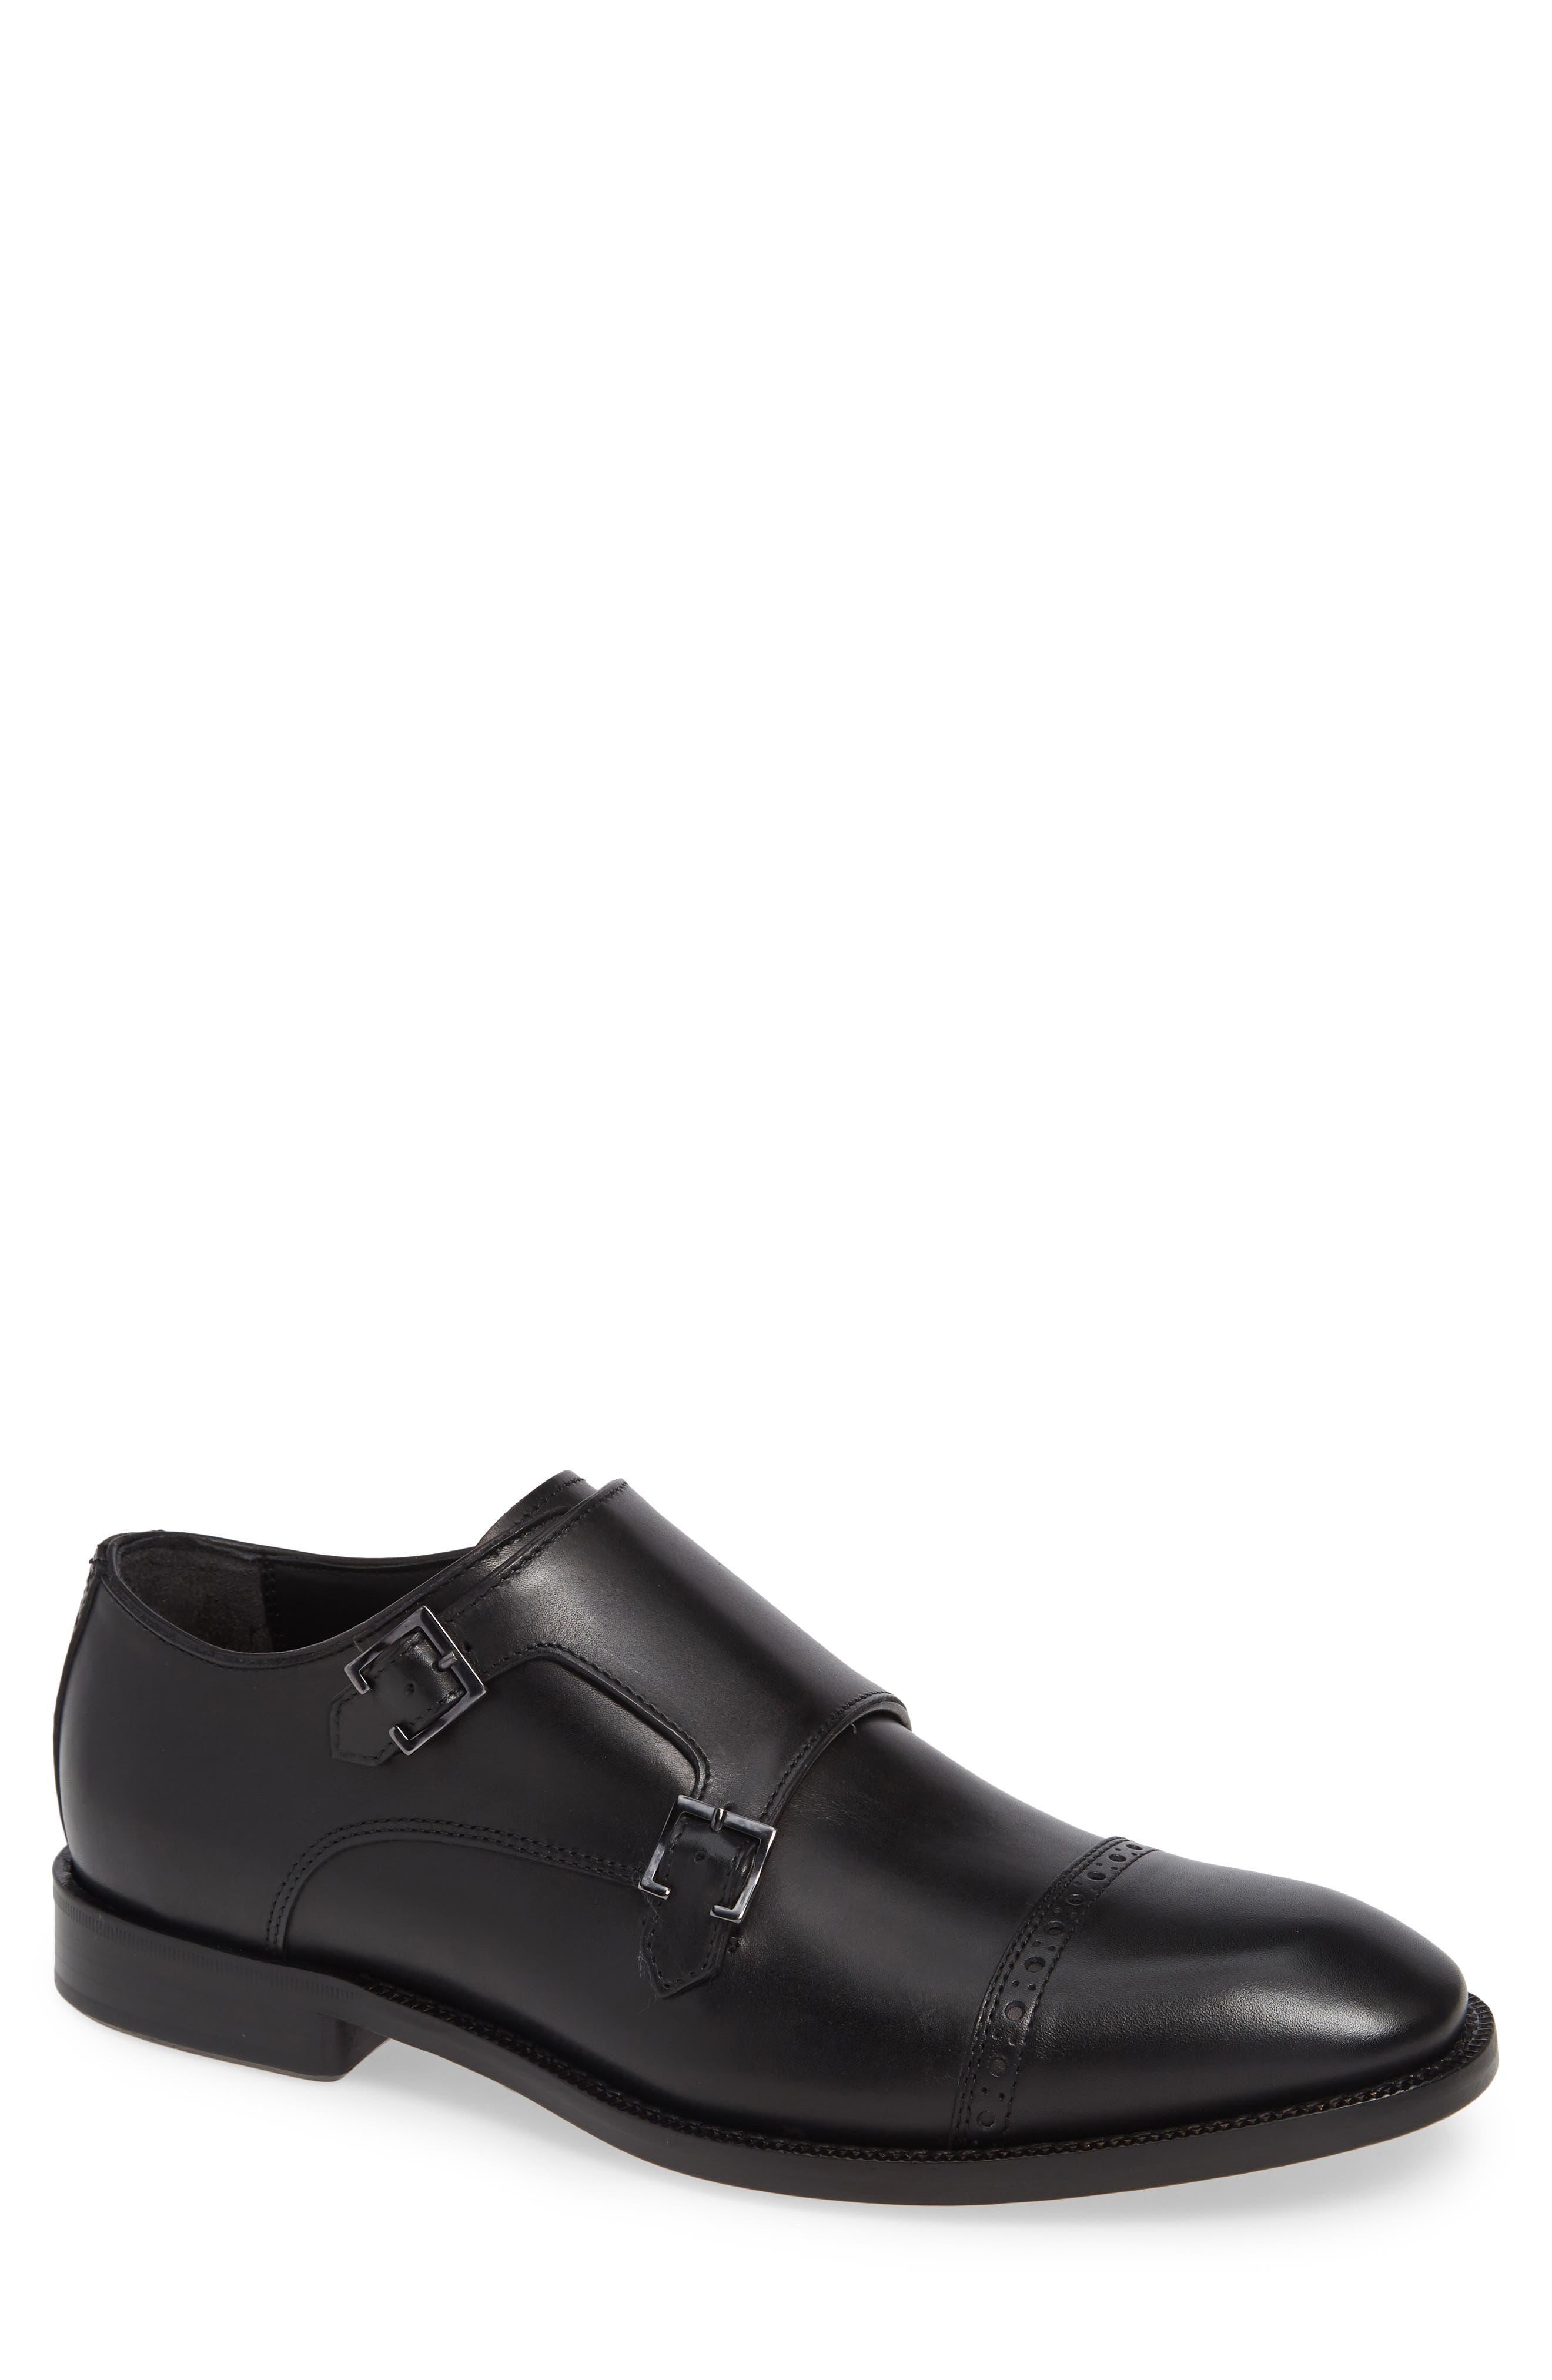 Caravaggio Double Monk Strap Shoe,                         Main,                         color, BLACK LEATHER